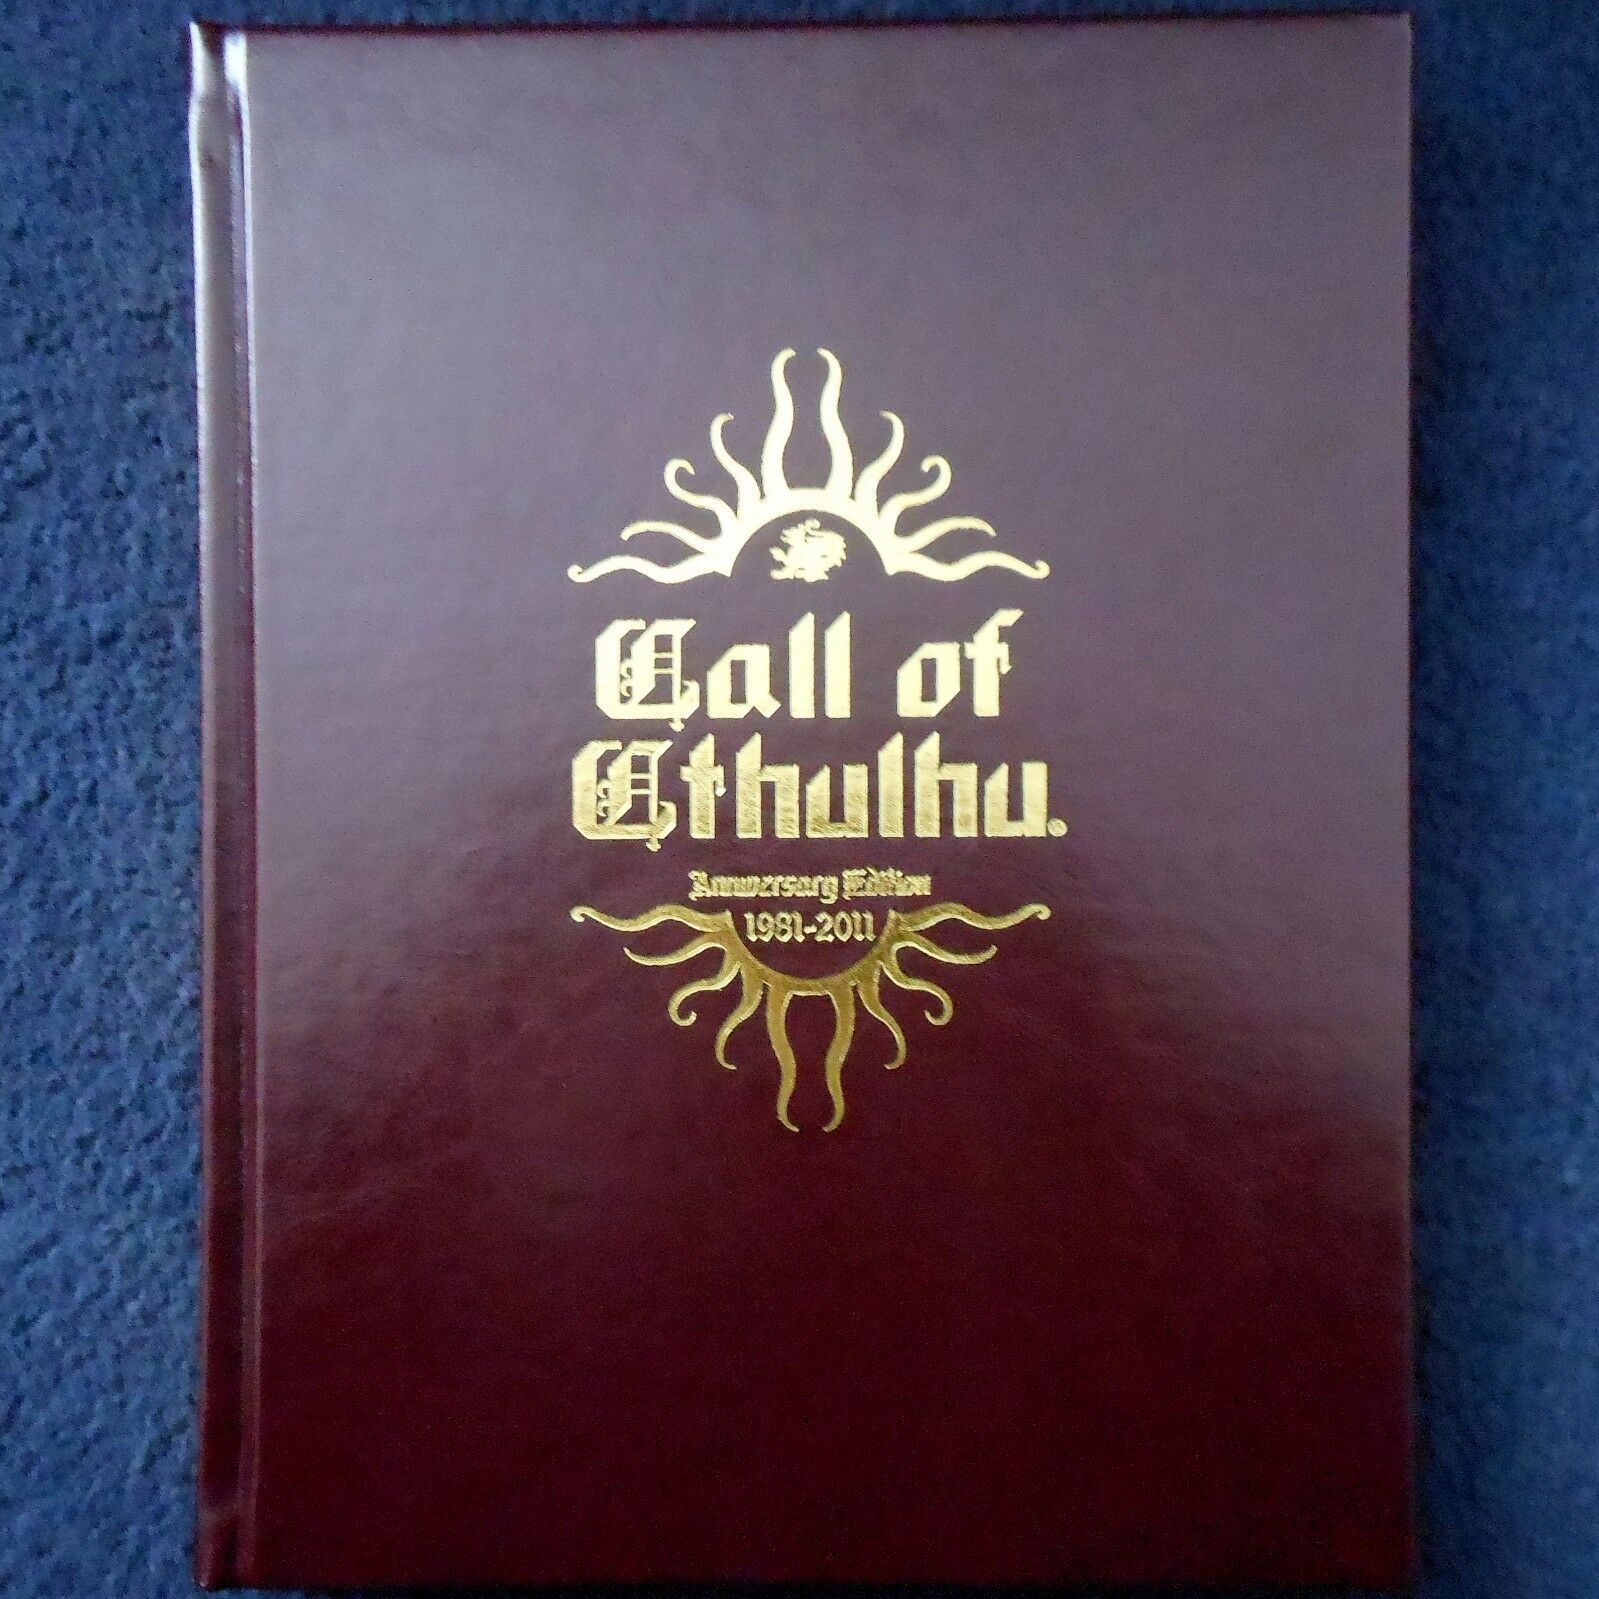 Call of Cthulhu 30th Edición de aniversario Regla Libro Gótico Horror Cthulu Juego Rpg